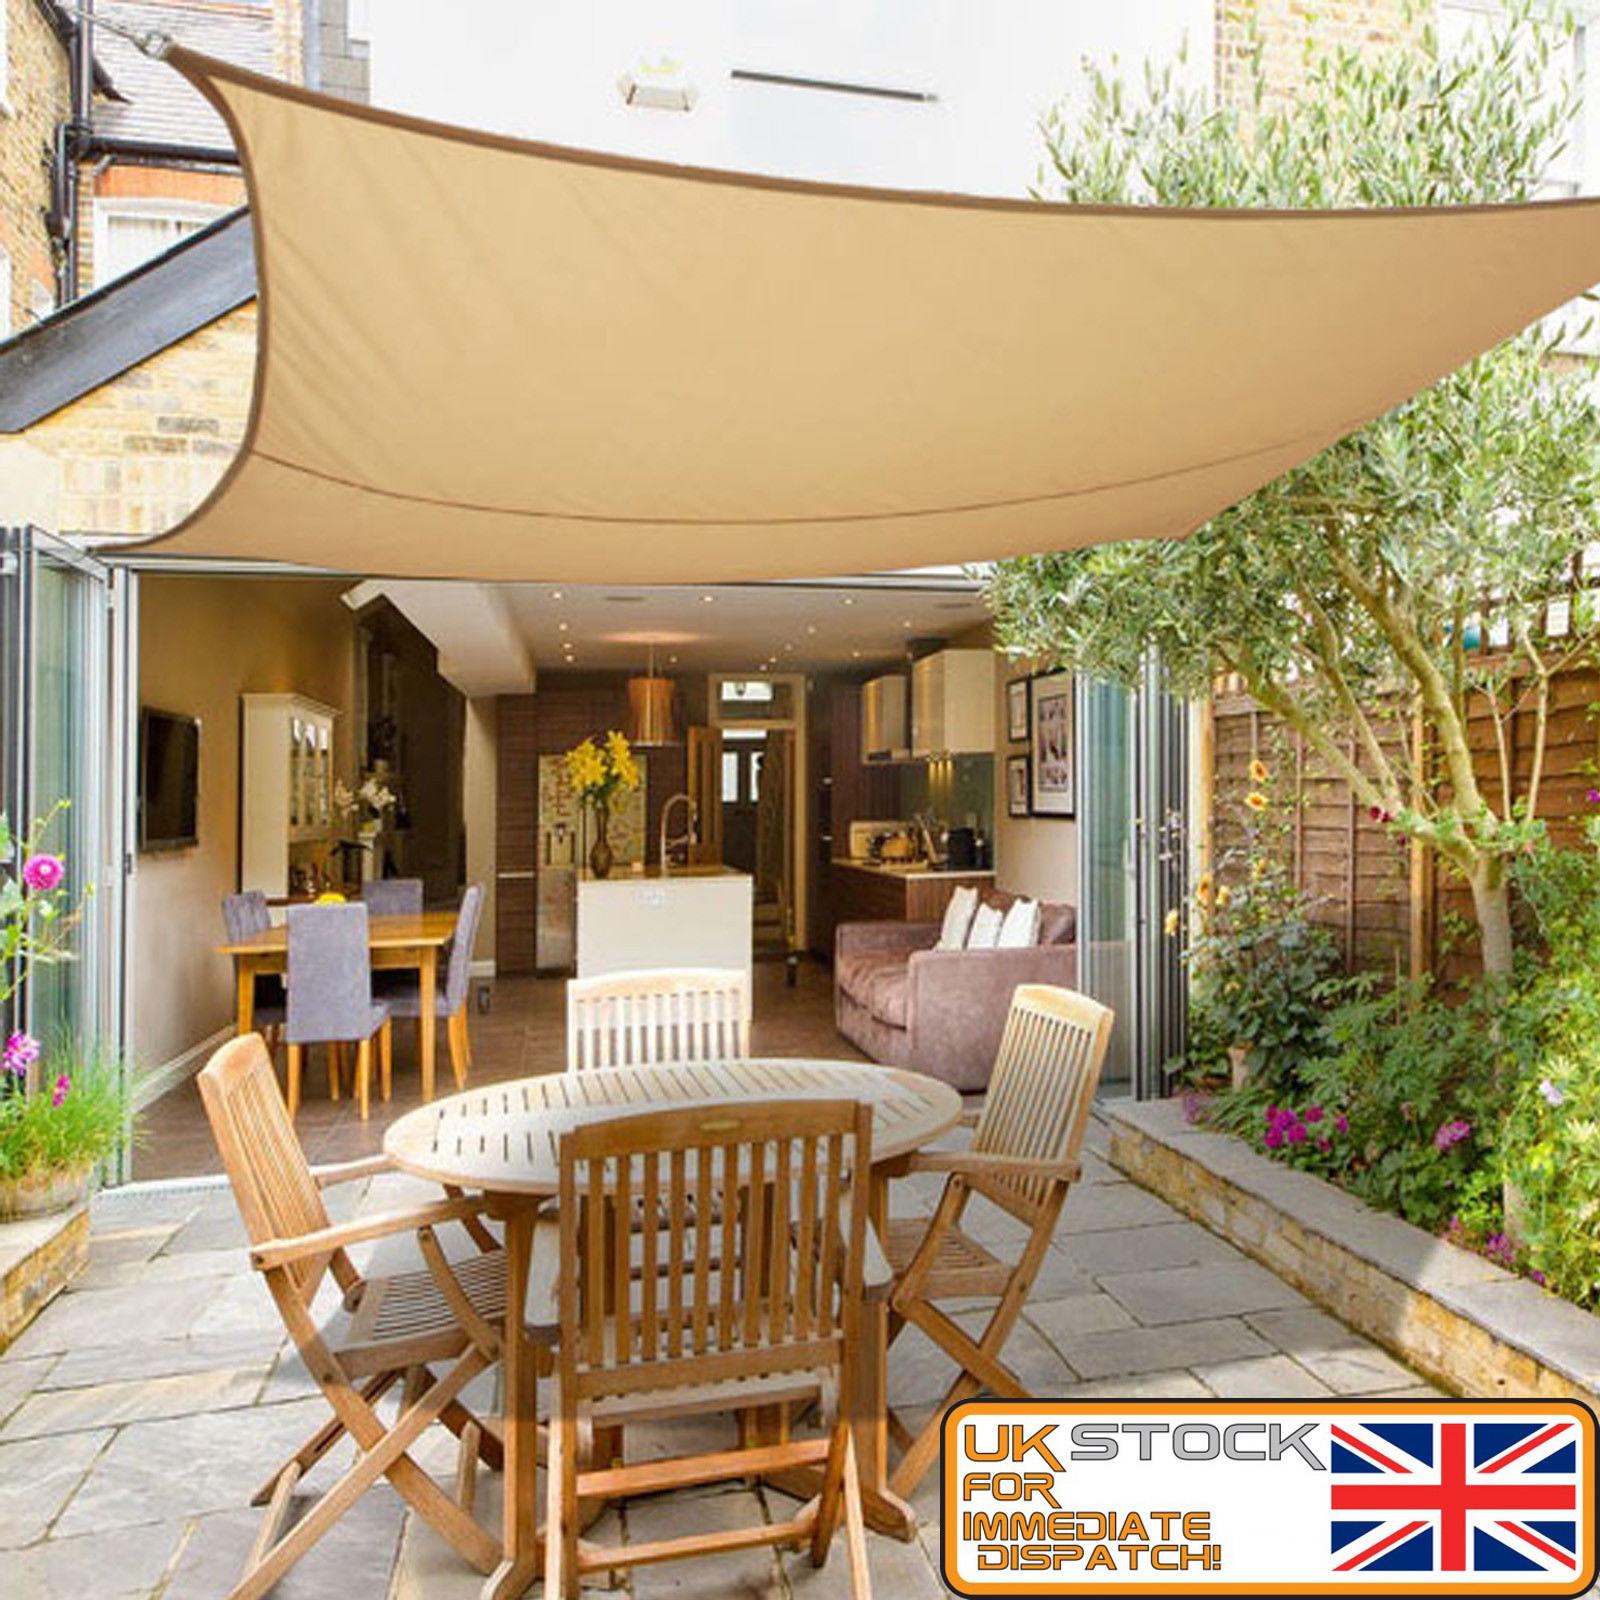 Details About Sun Shade Sail Garden Yard Patio Sunscreen Awning Canopy Uv Screen Waterproof